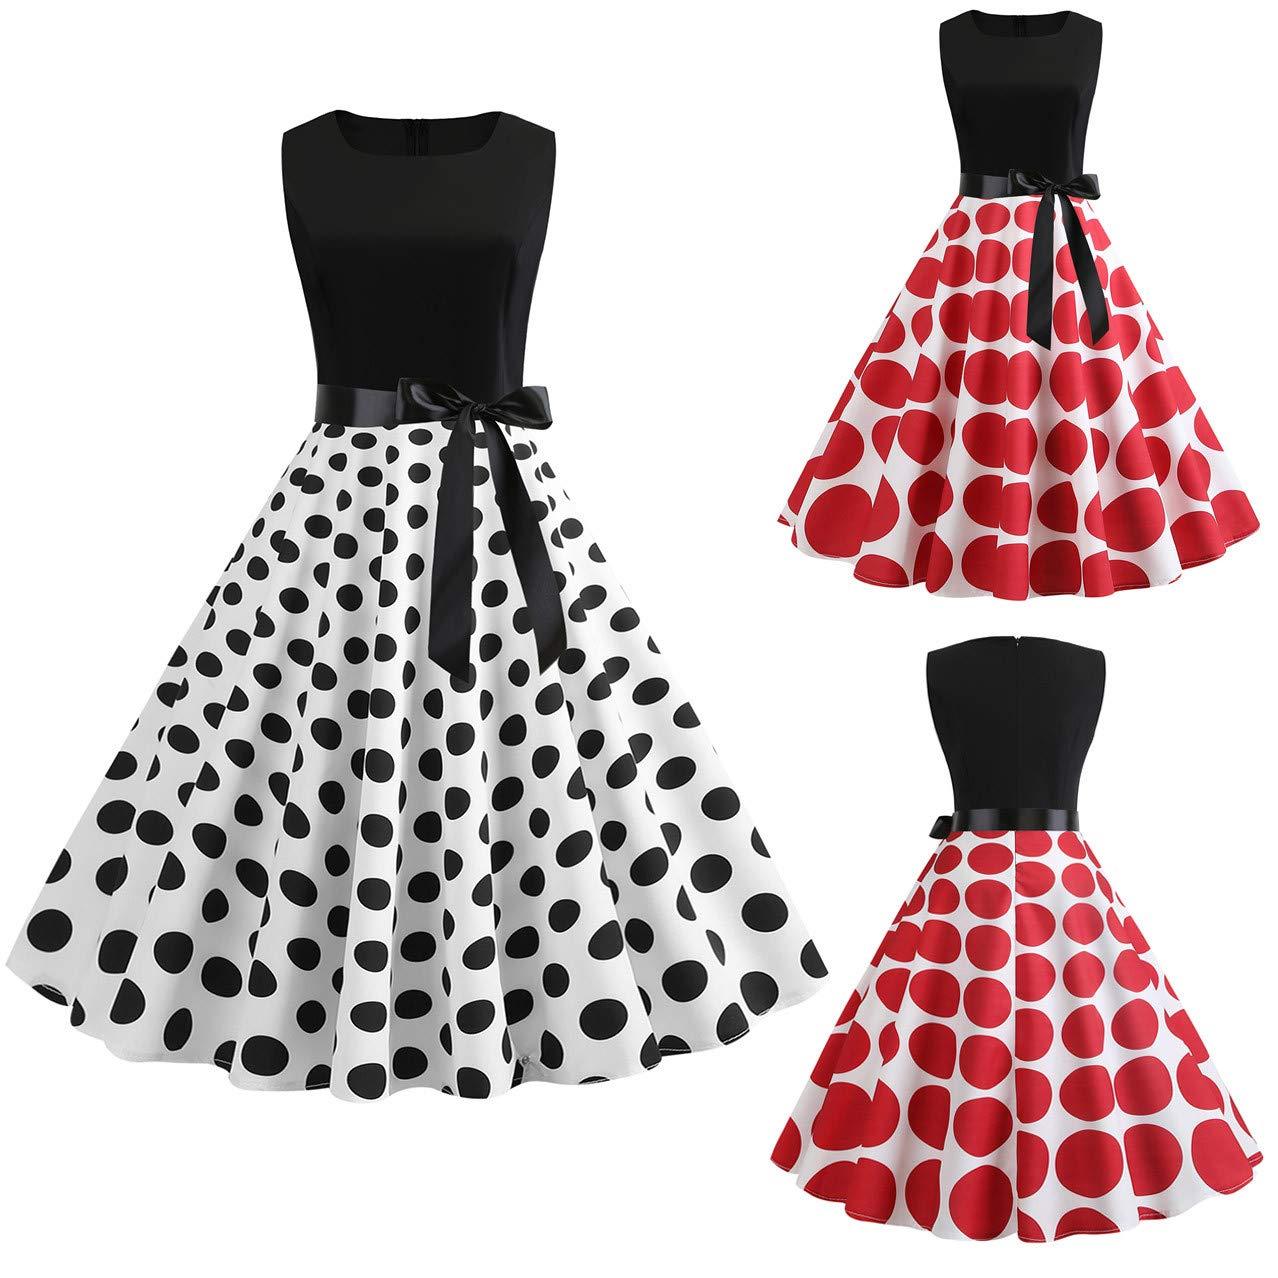 Cloudro Dress Vintage 1950s Retro Sleeveless O Neck Print Evening Party Prom Swing Dress